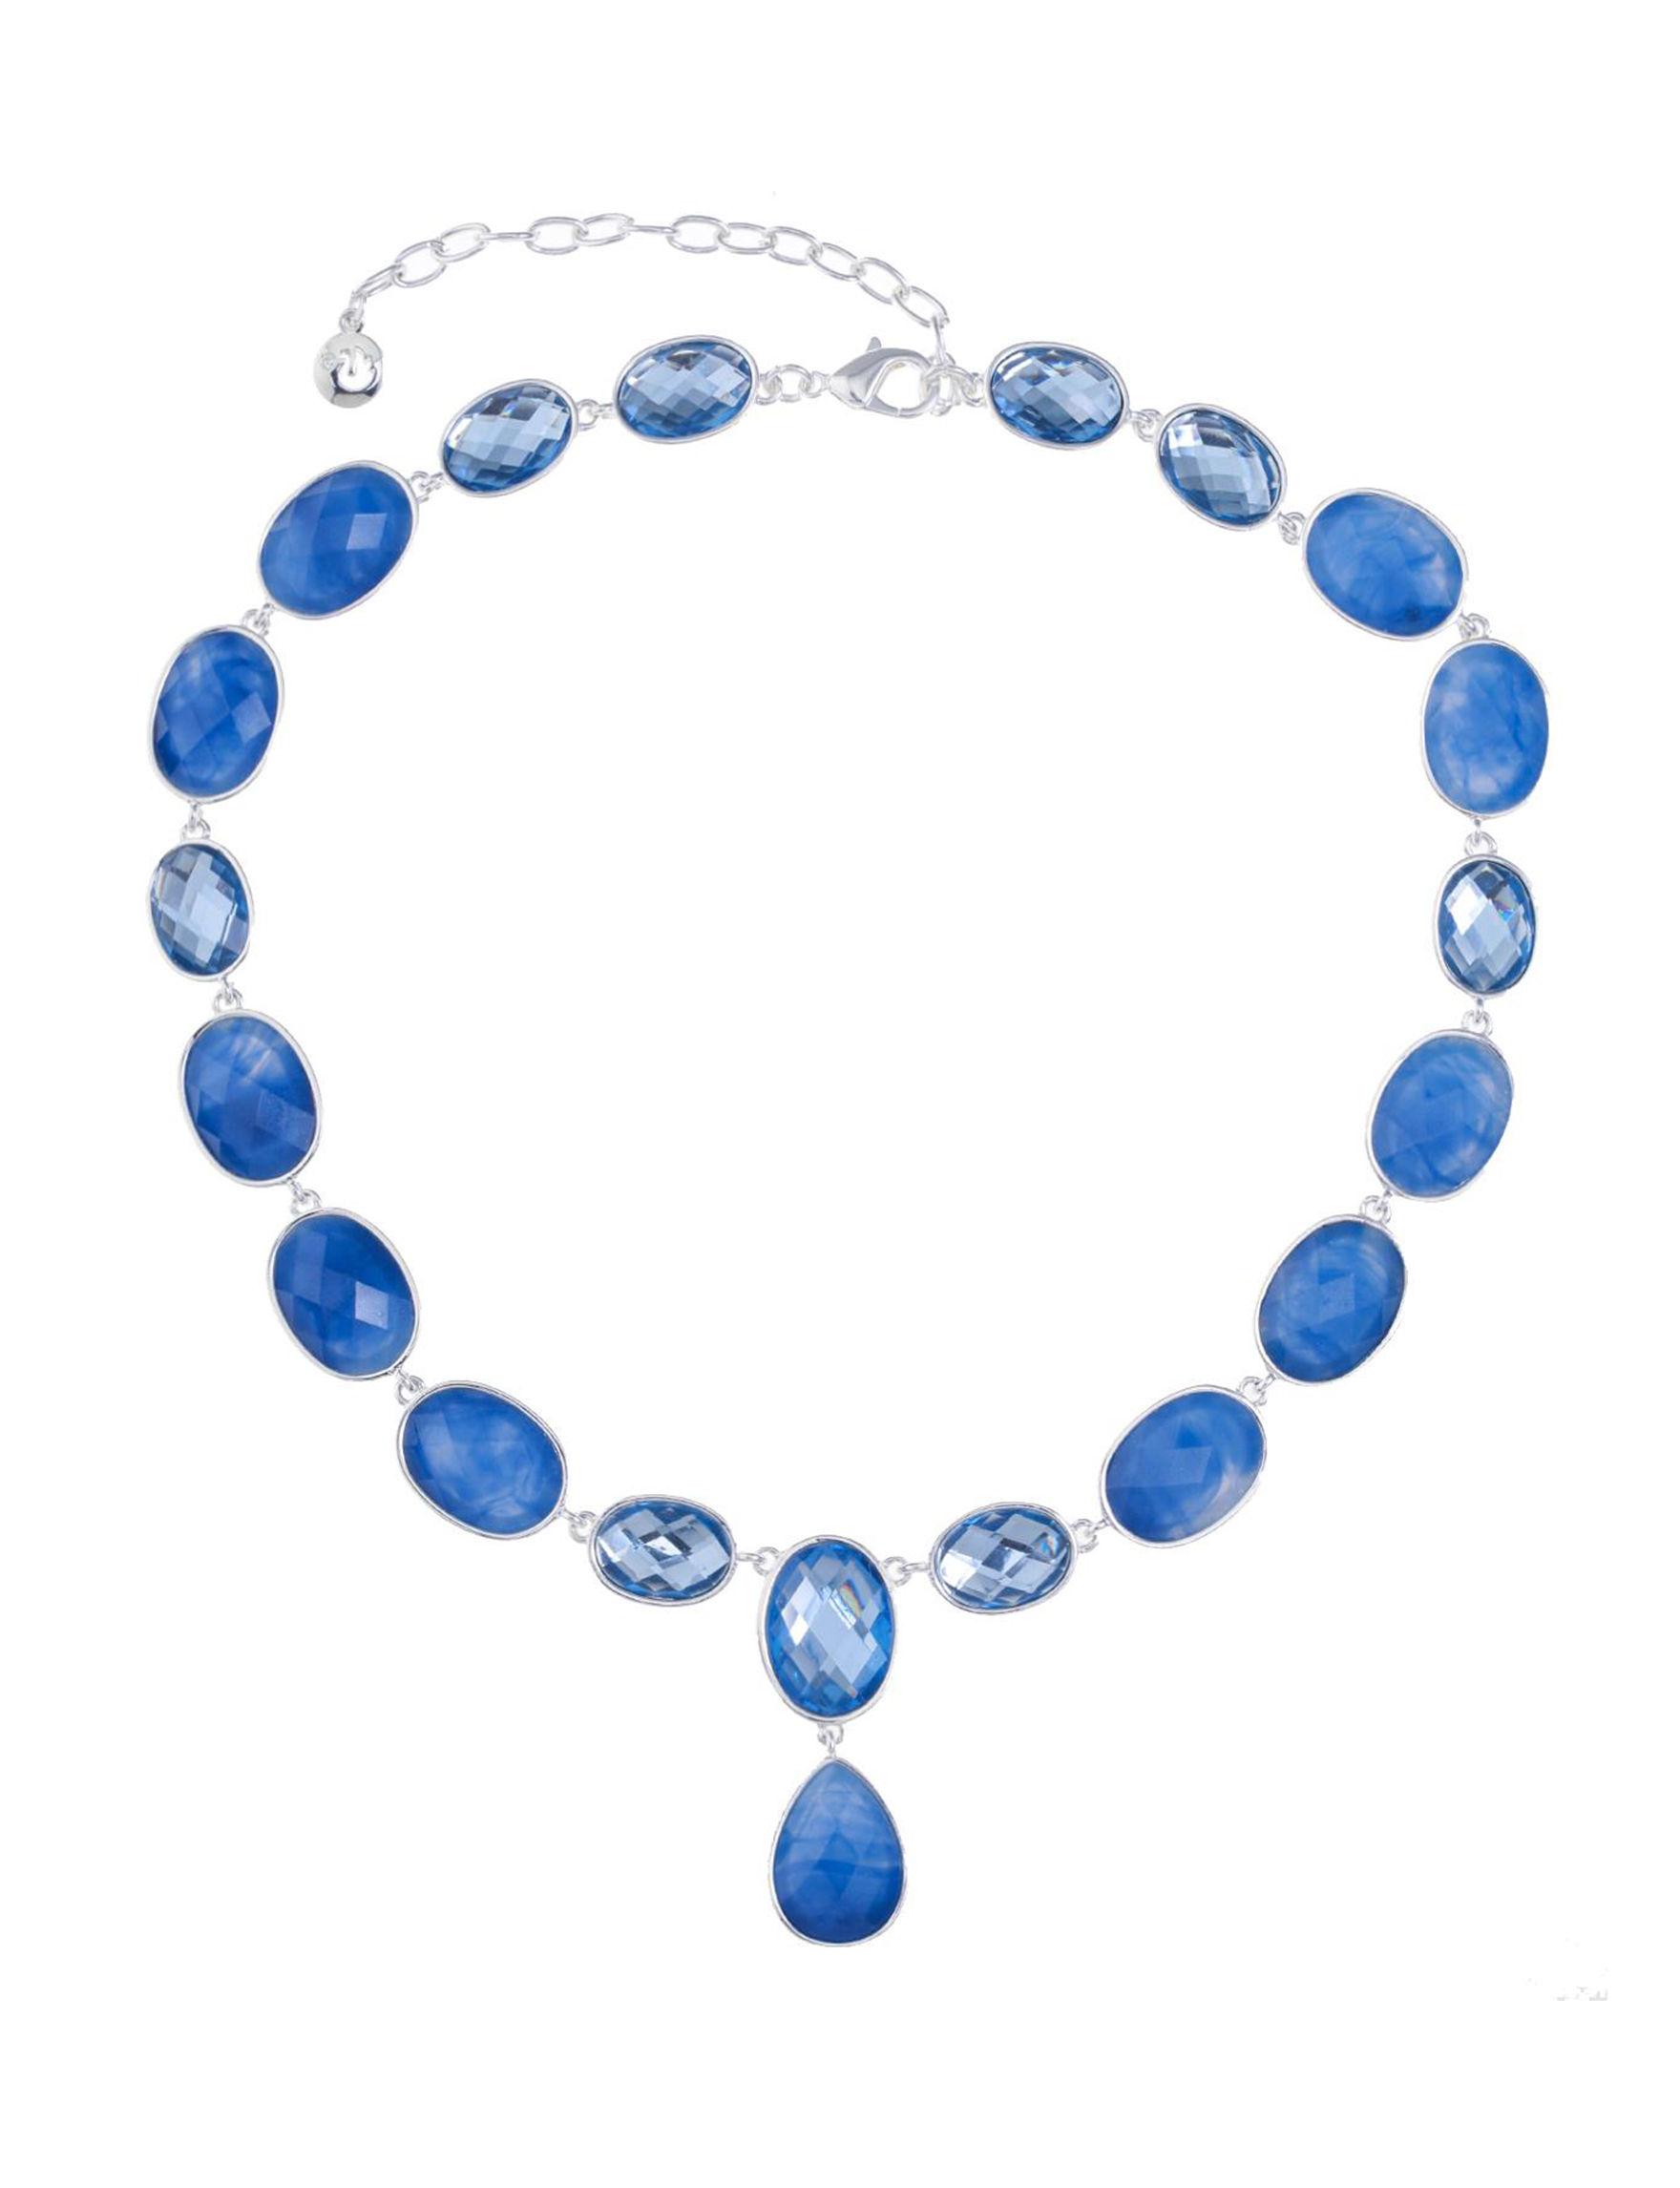 Gloria Vanderbilt Silver / Blue Stone Necklaces & Pendants Fashion Jewelry